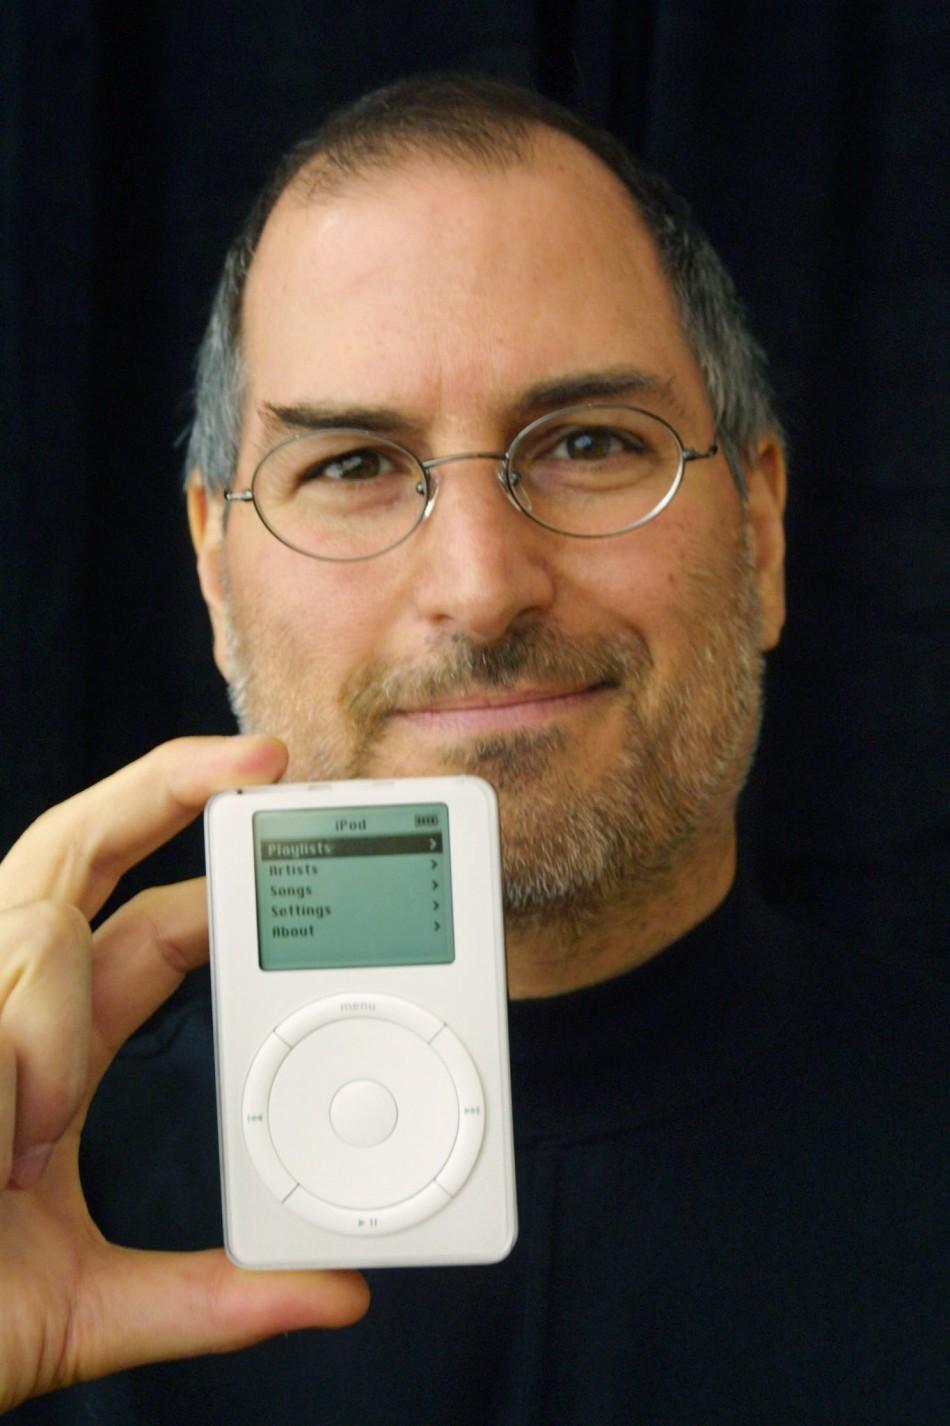 steve-jobs-ipod